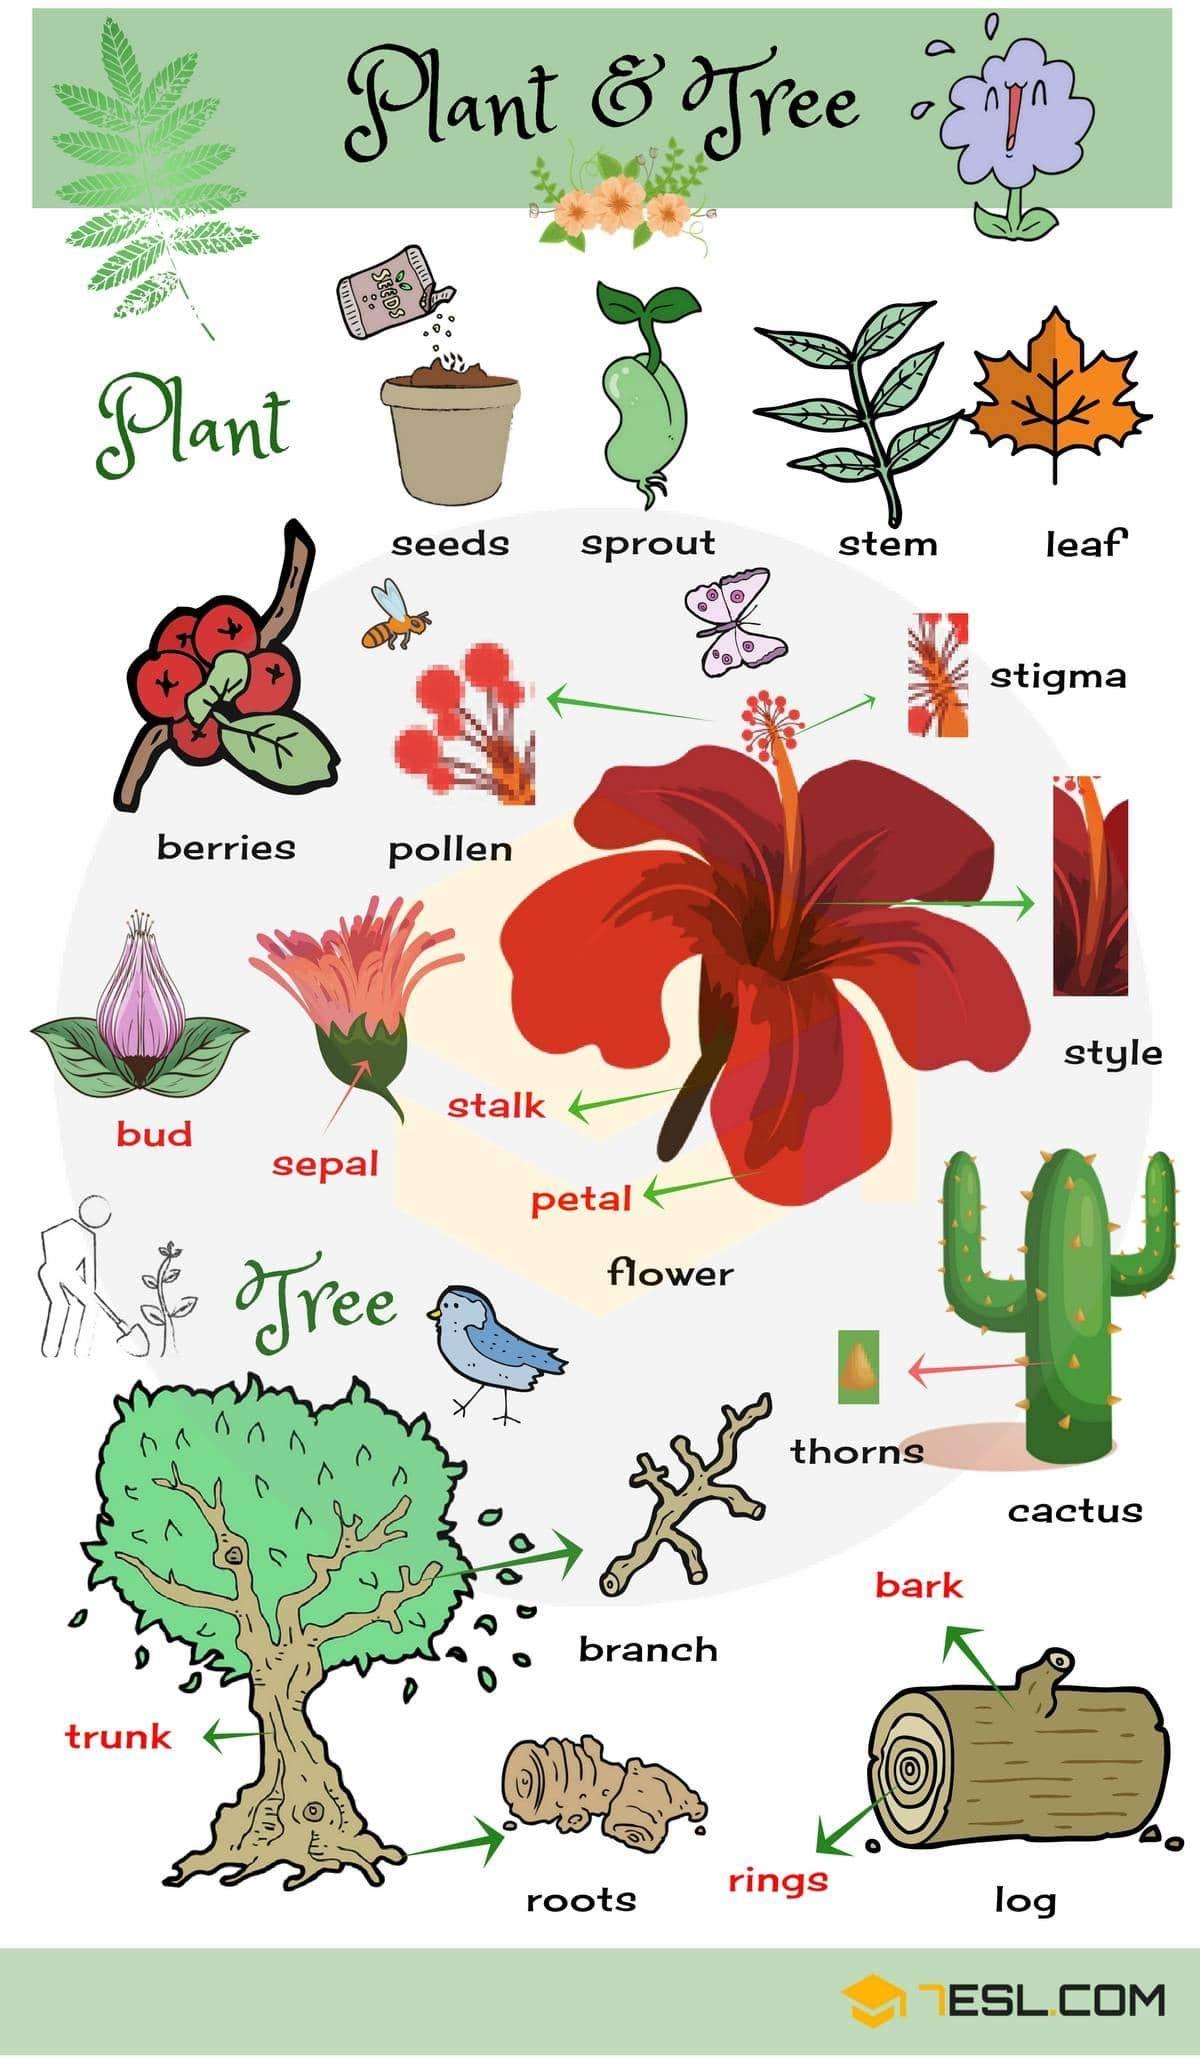 Plants And Trees Vocabulary English Vocabulary English Language Learning English Language Teaching